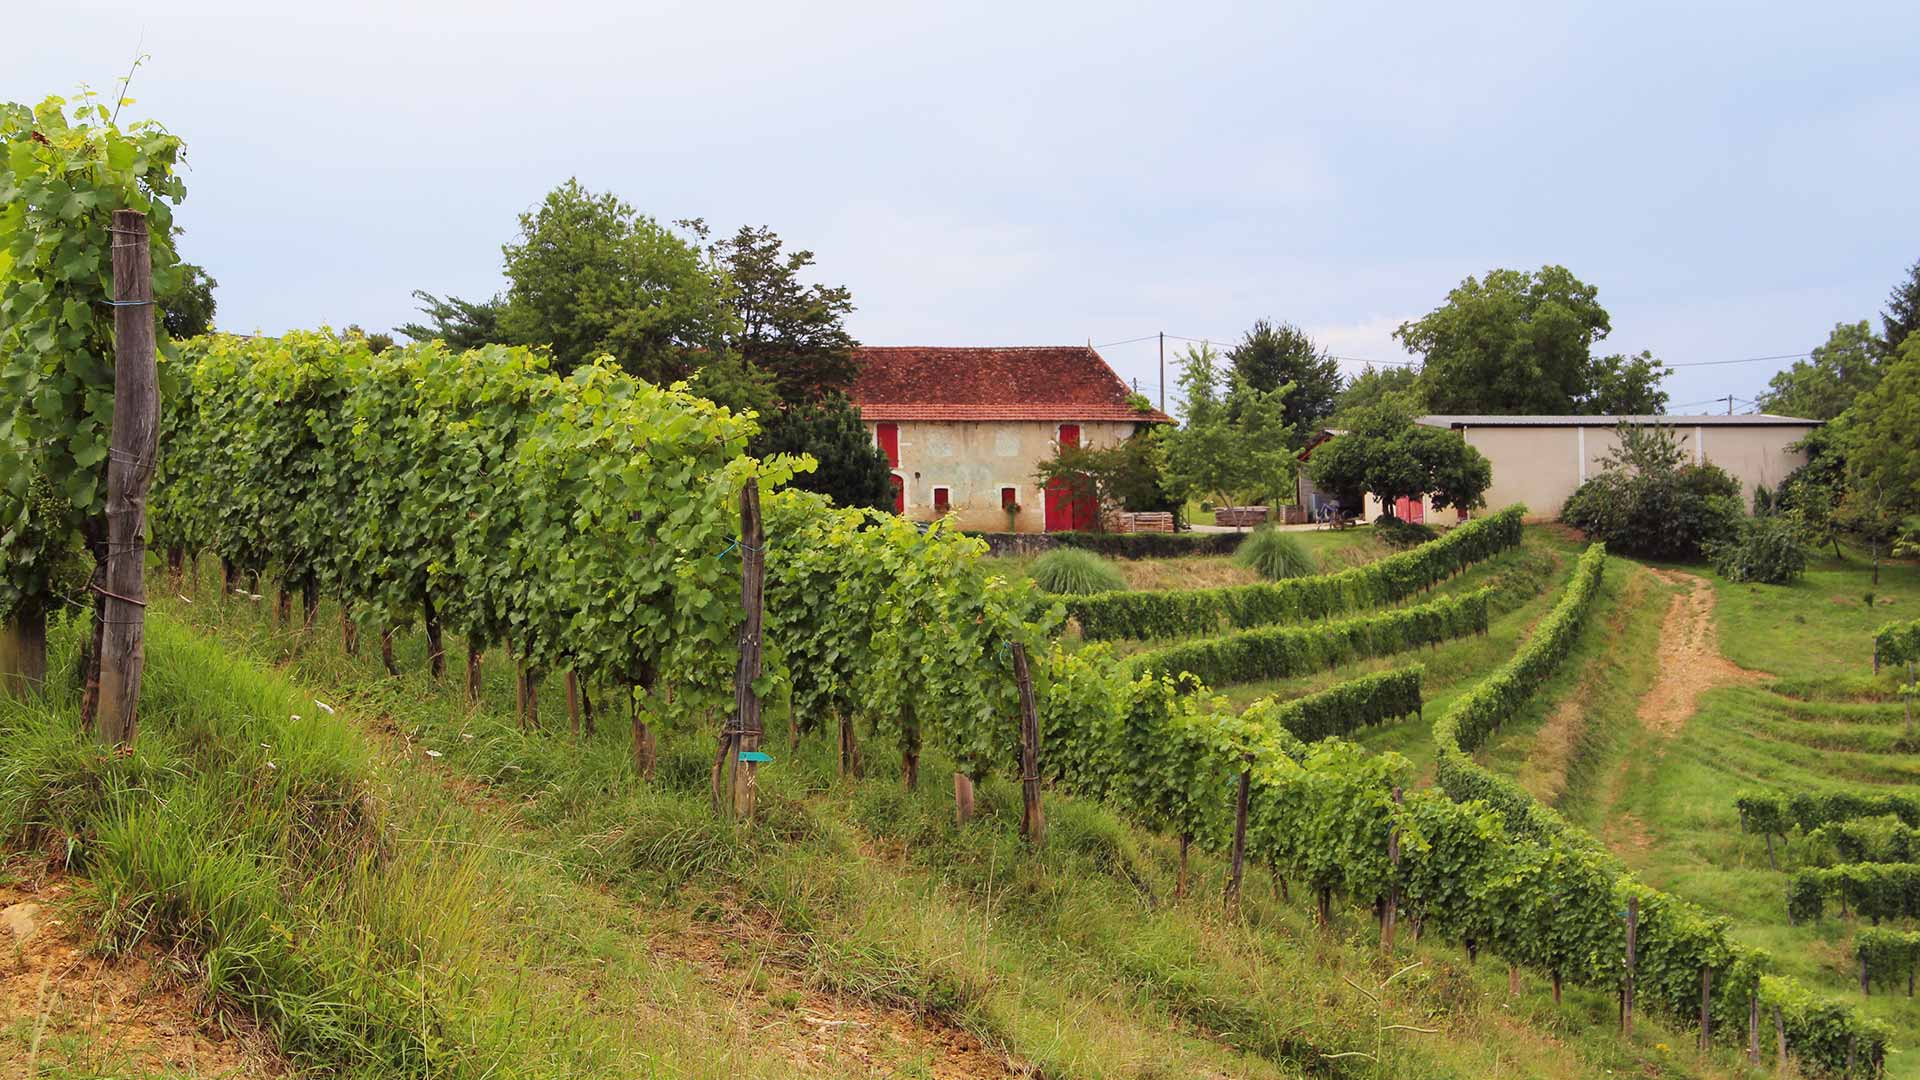 jurancon-domaine-larreydia-vignes-maison